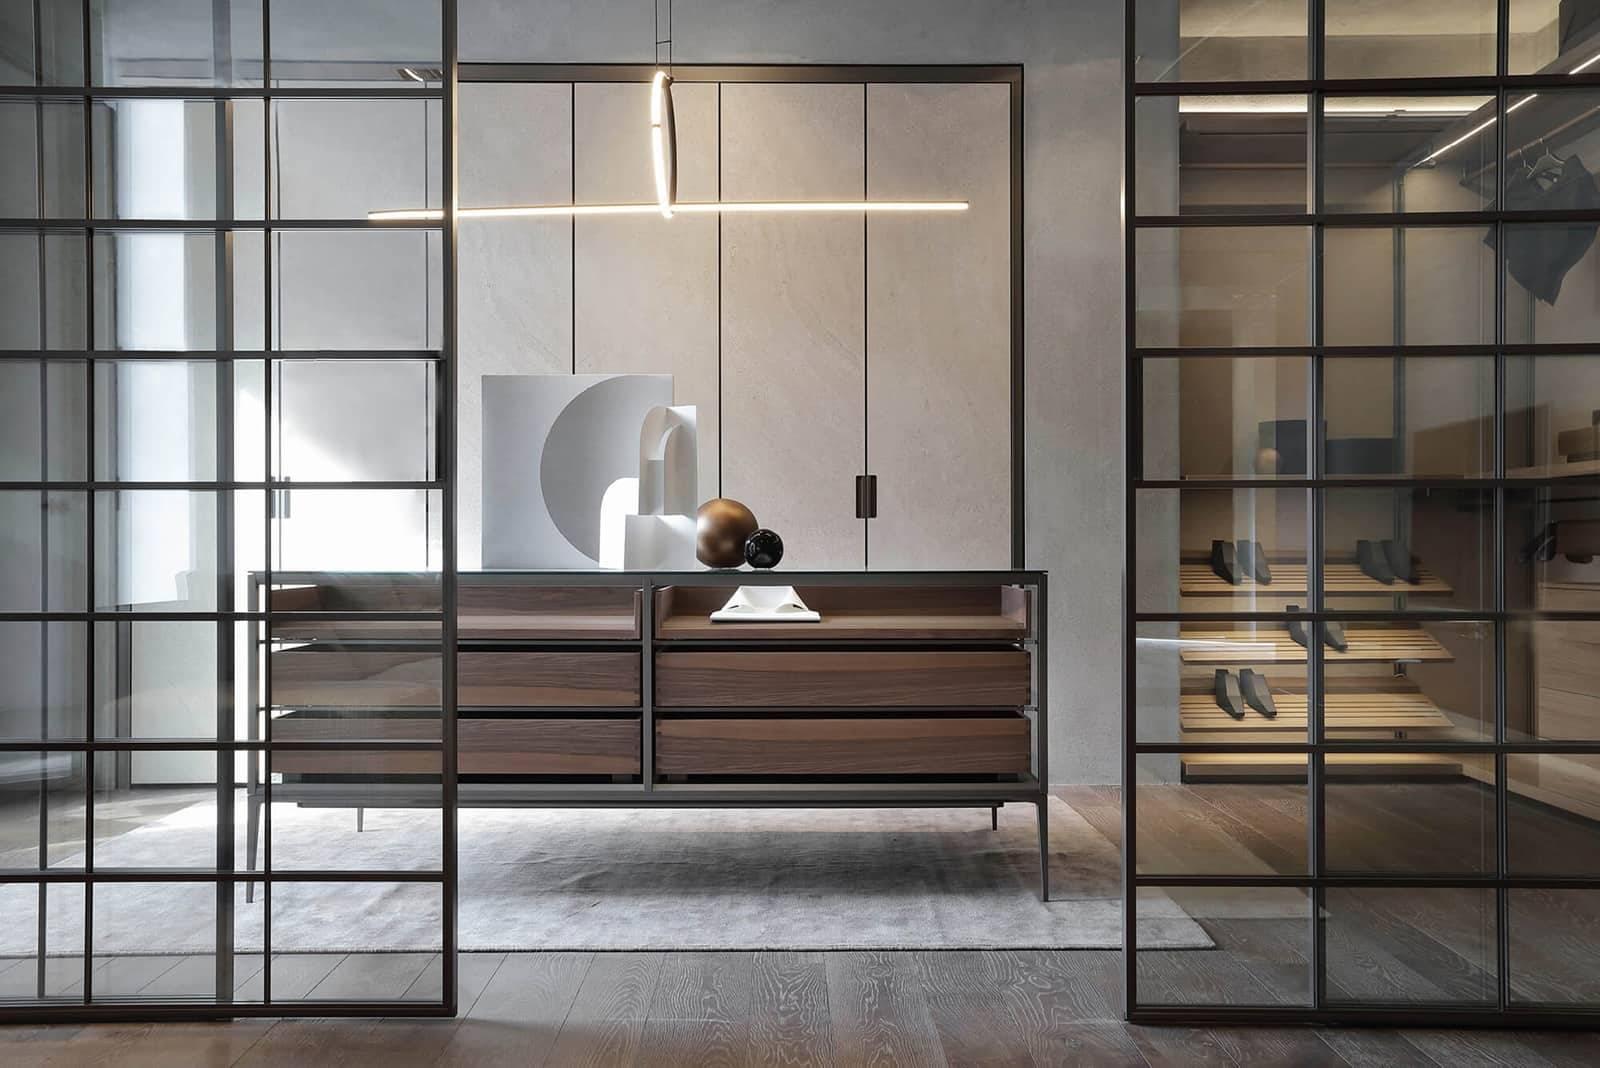 rimadesio alambra isola dressoir voor inloopkast italiaans design